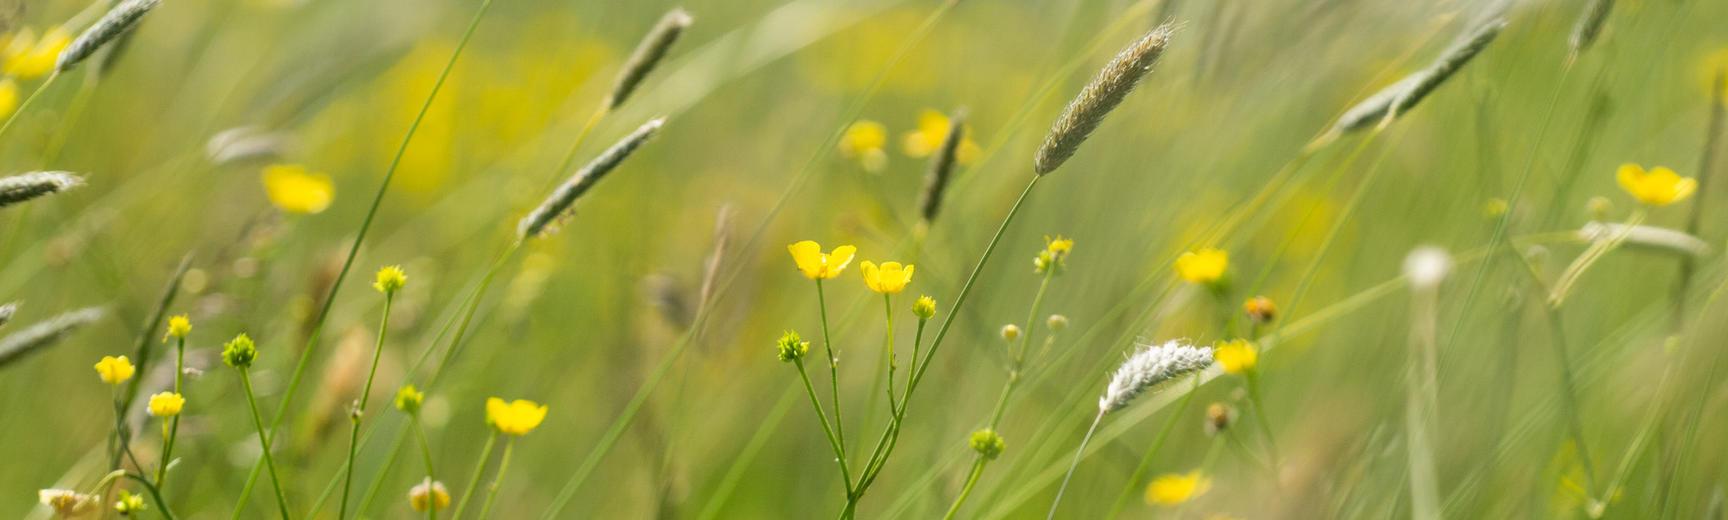 Harcourt Arboretum - Wildflower meadow